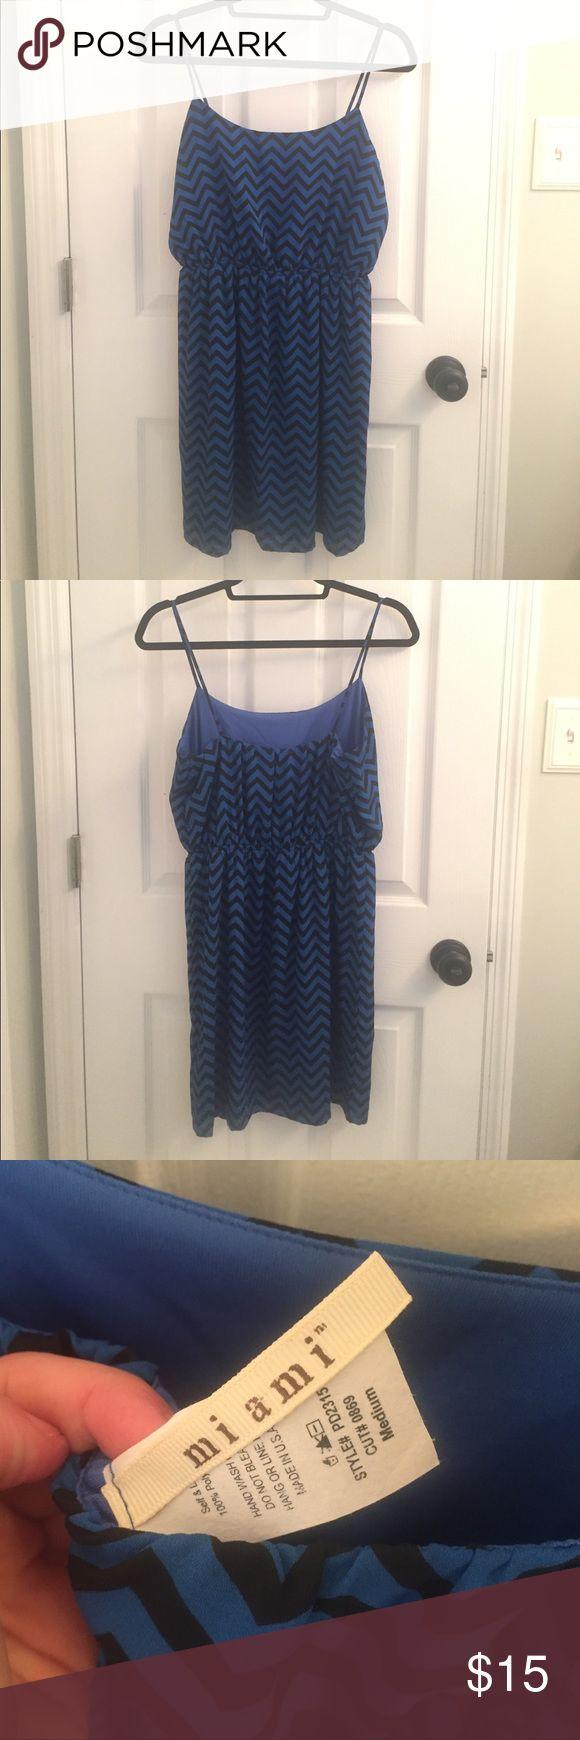 Blue and Black Chevron Dress Only worn twice. Super cute!! Dresses